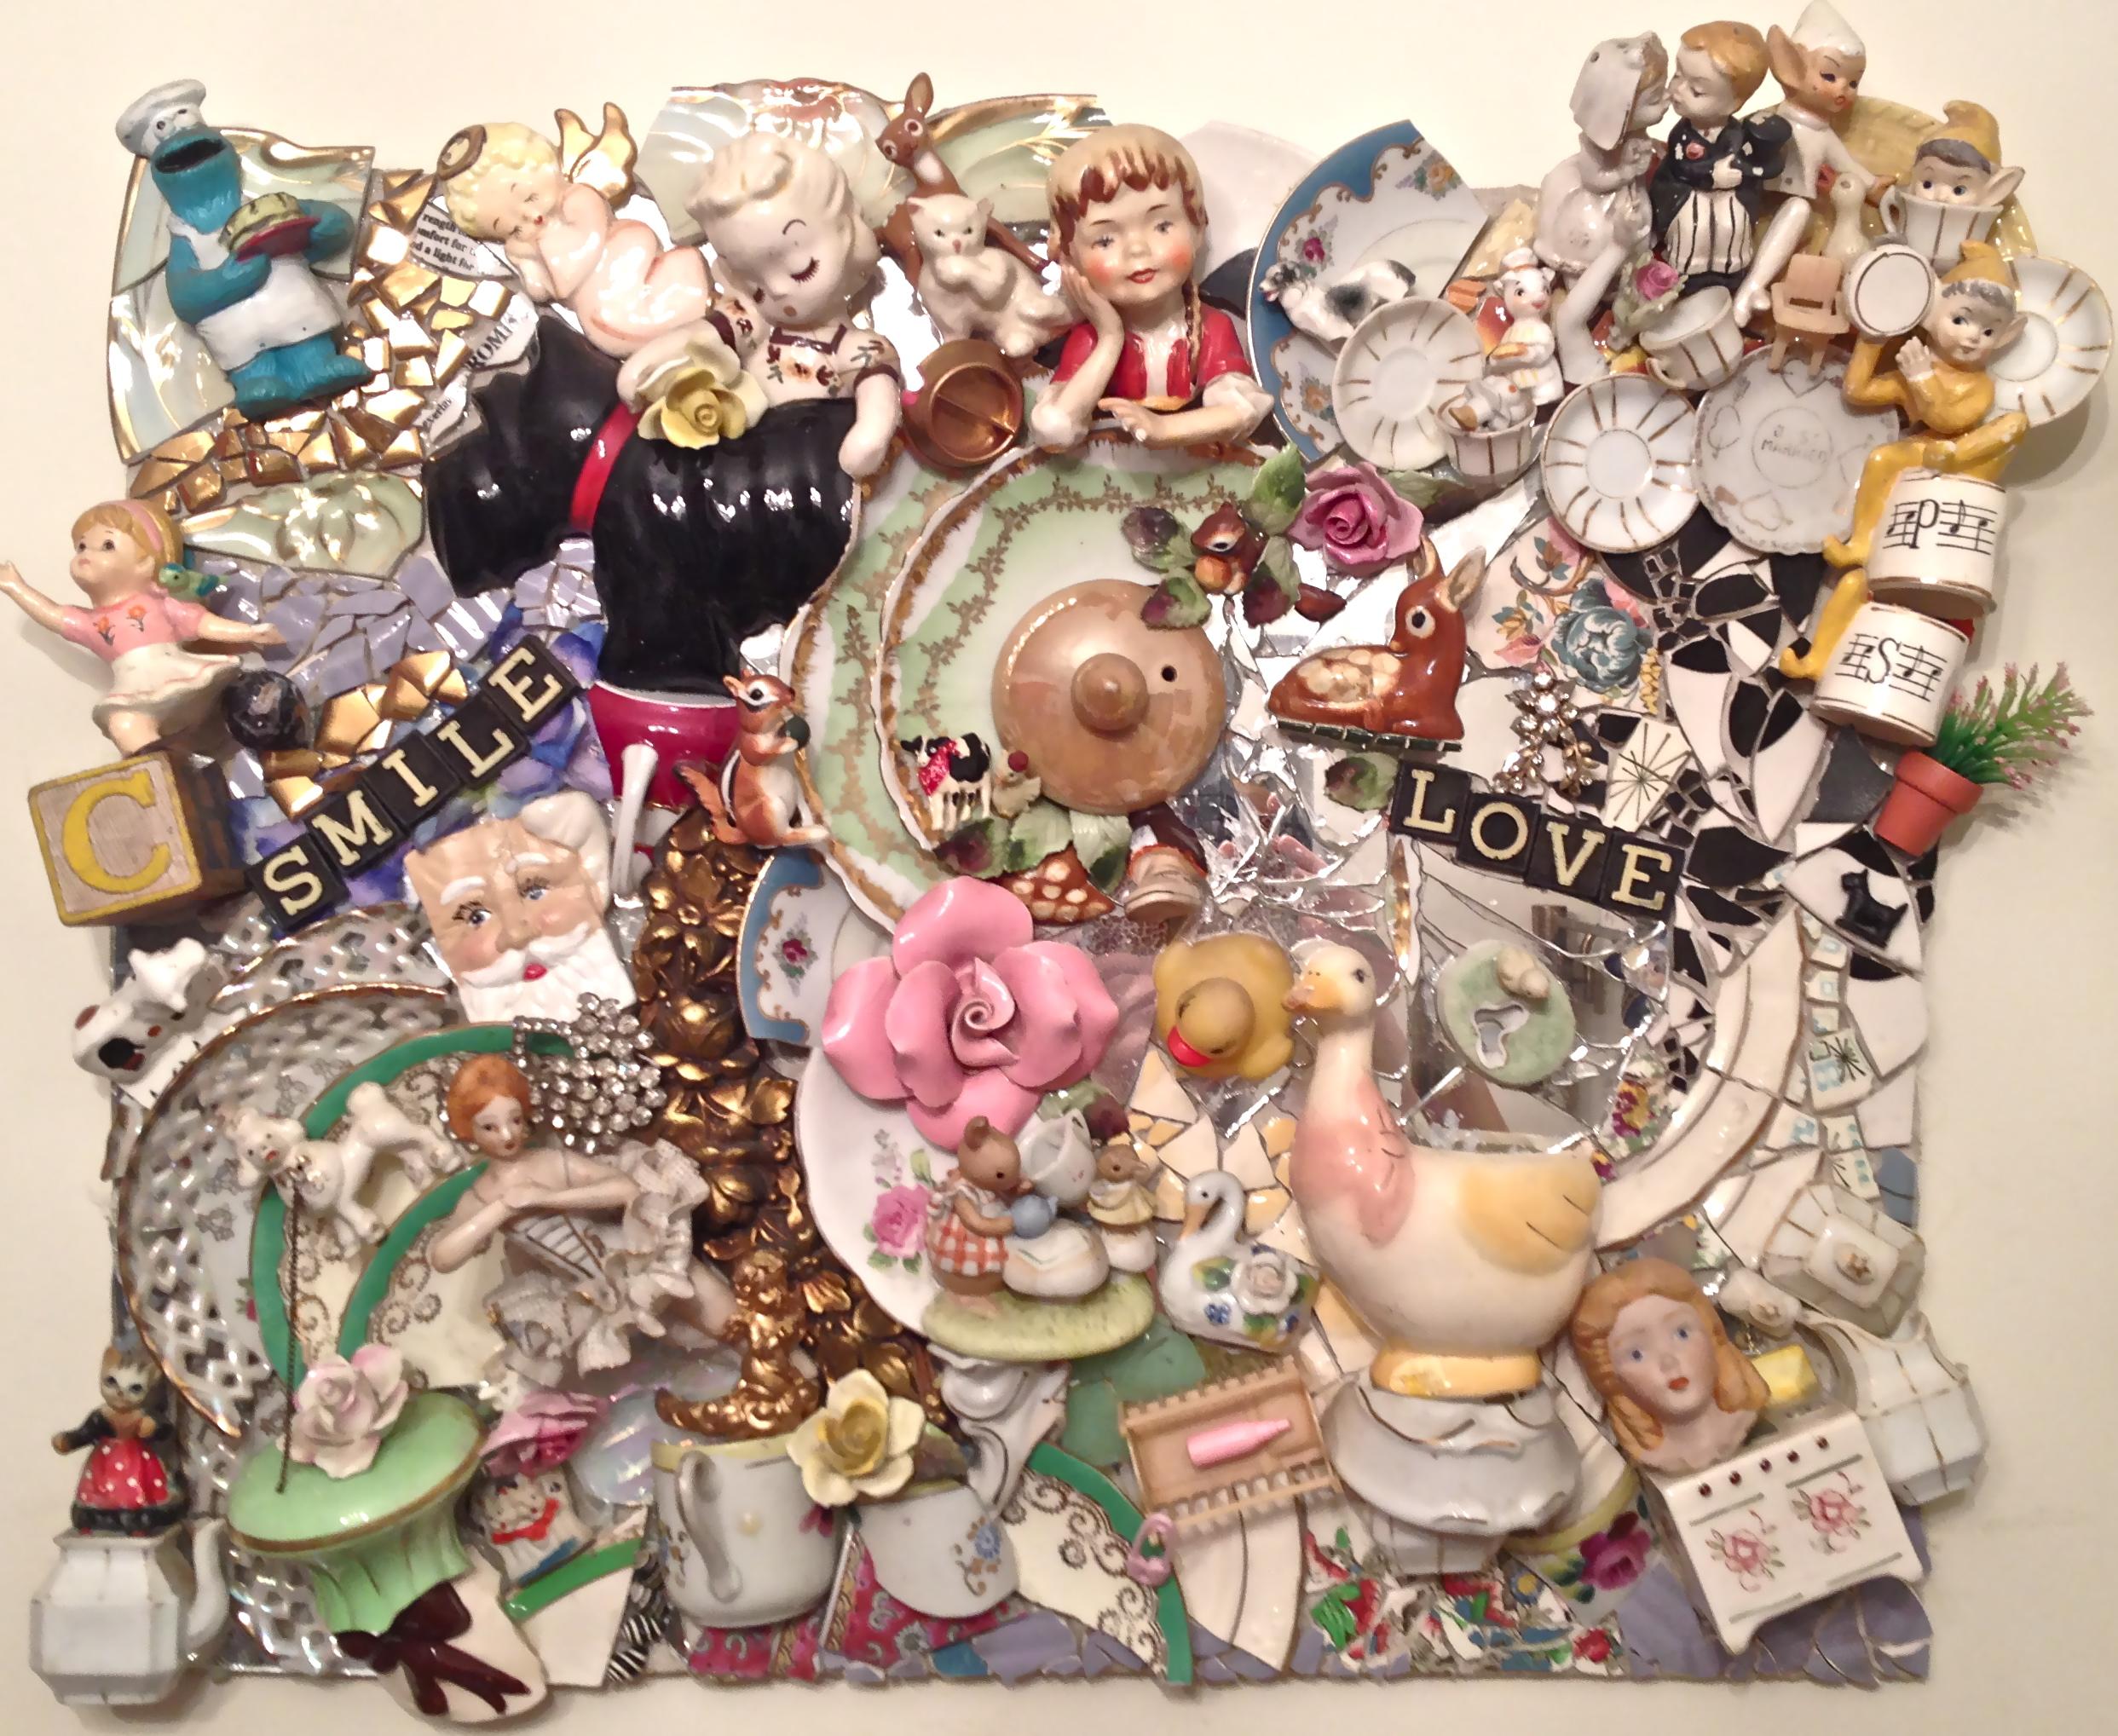 Childhood Dreams w/ Vintage Figurines Wall Hanging  19x22 $1800